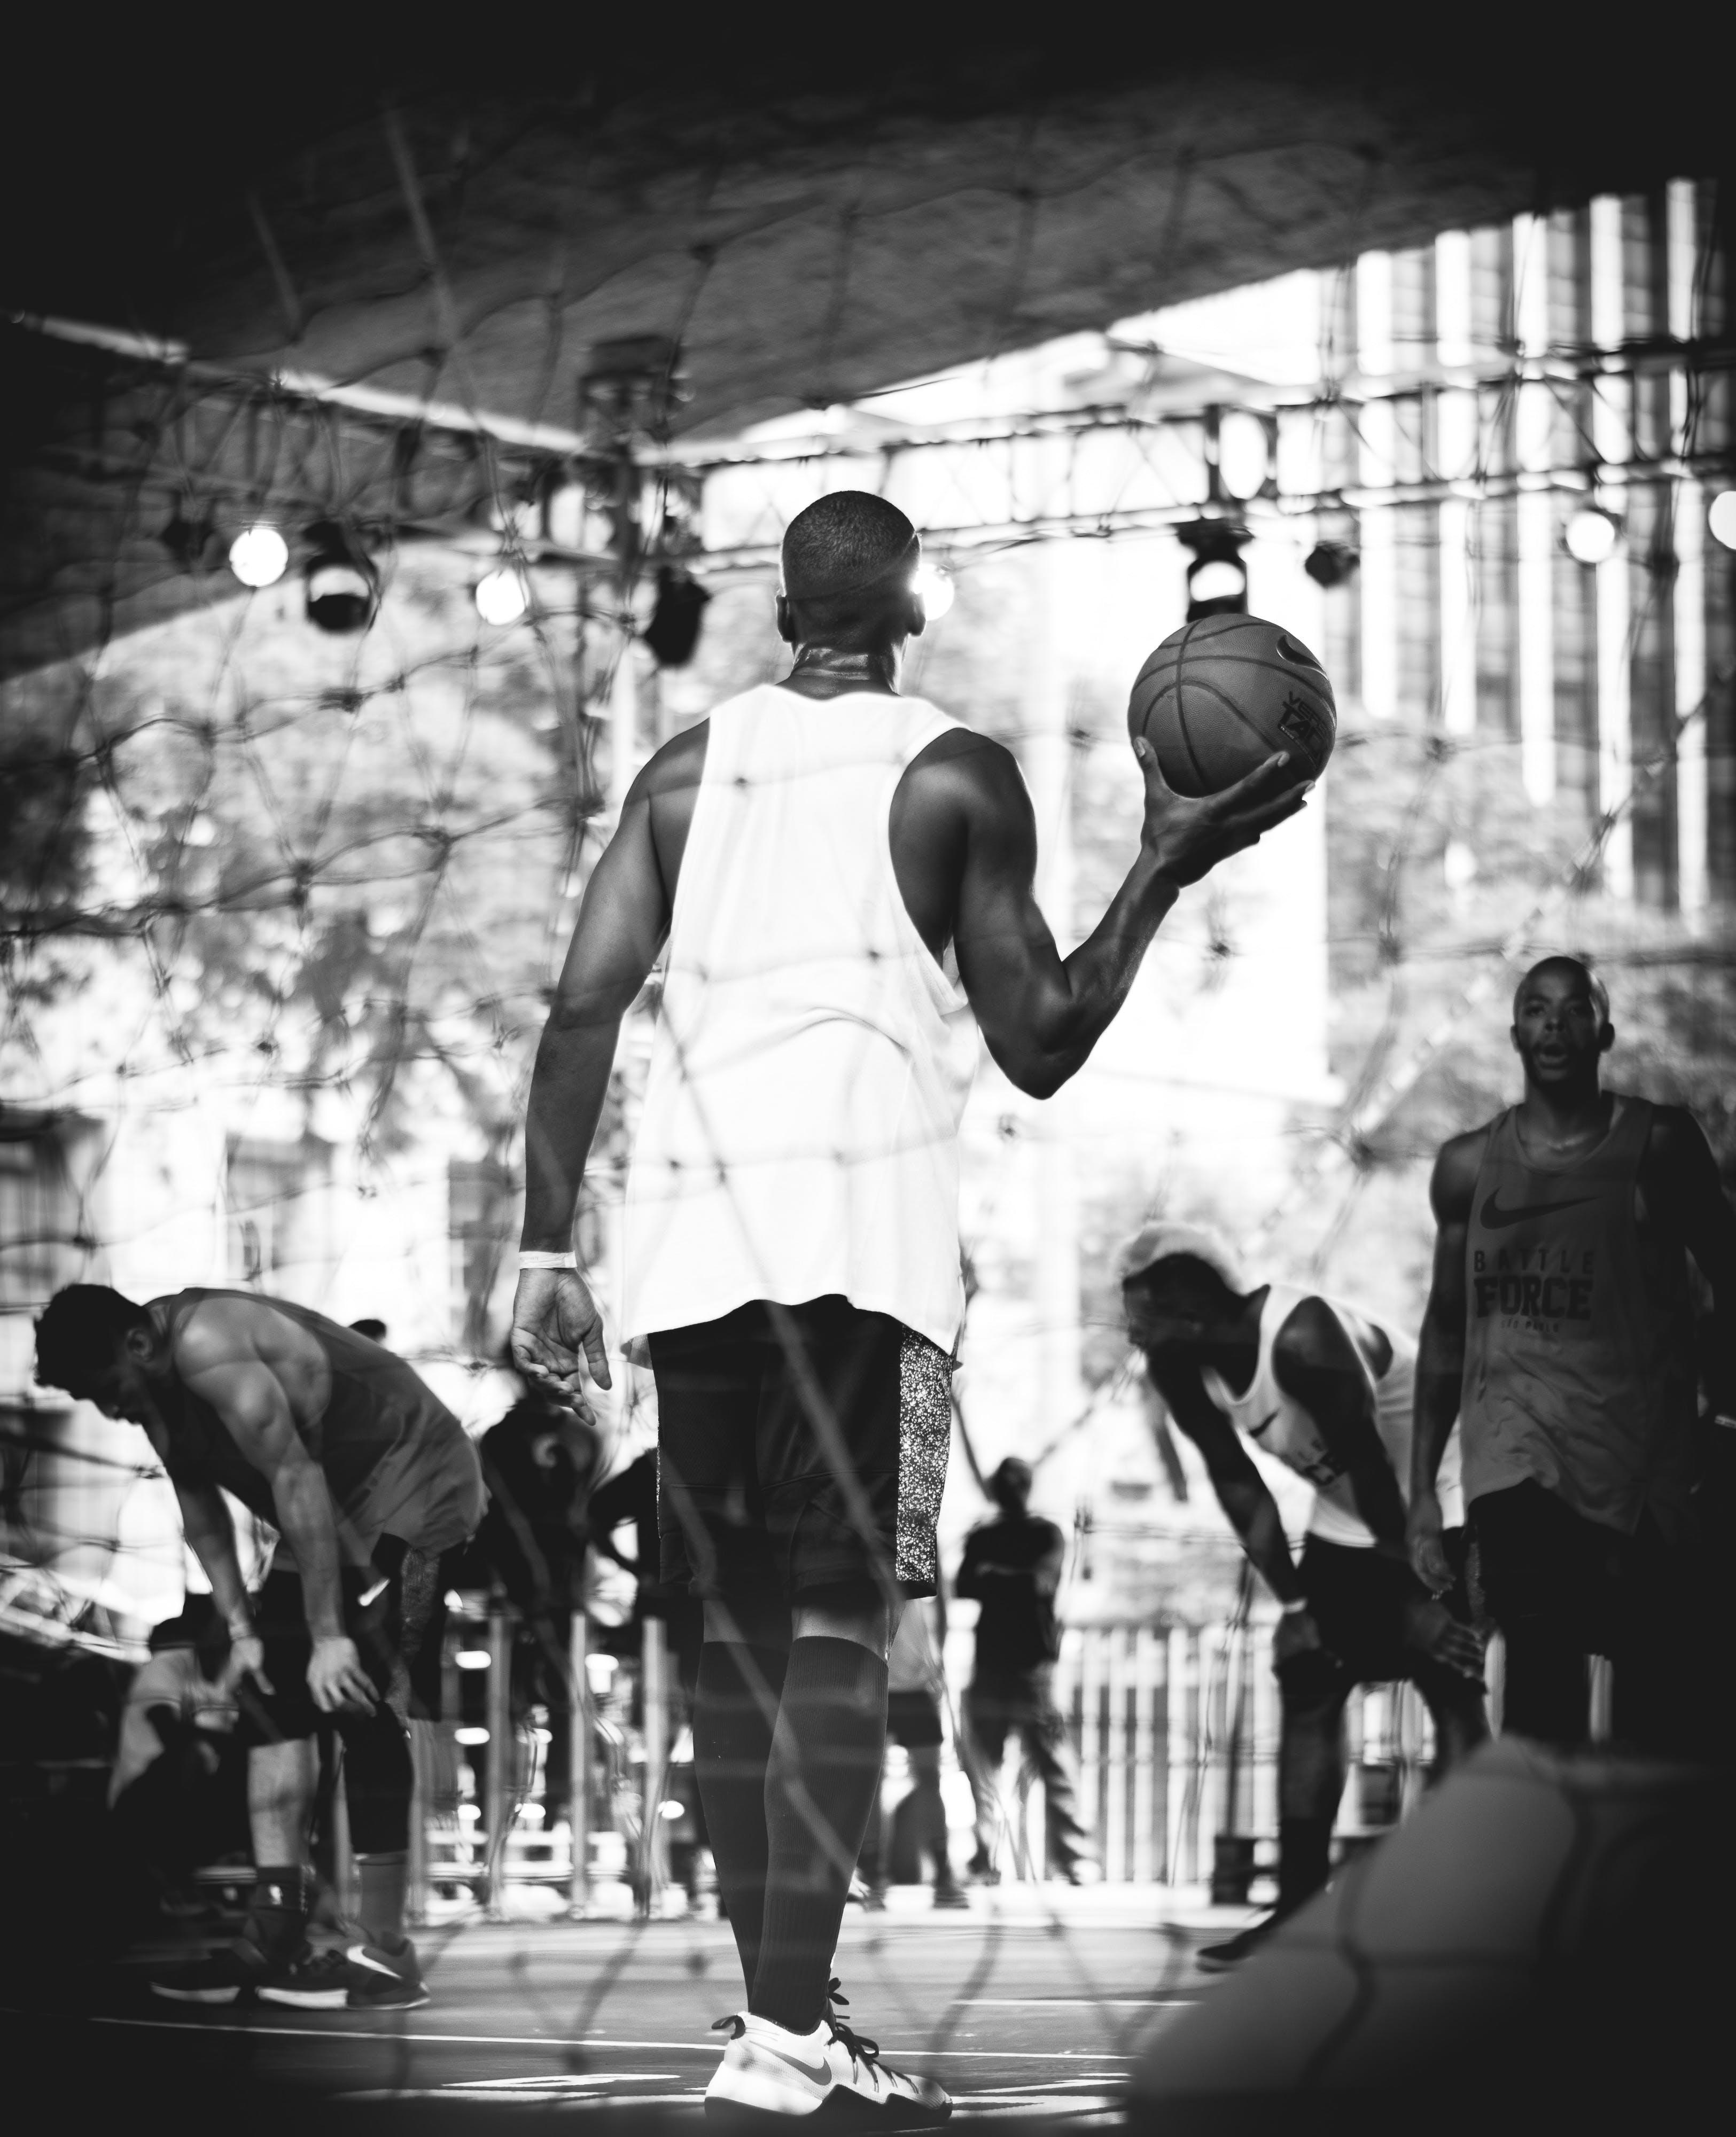 Grayscale Photography of Man Holding Basketball Ball